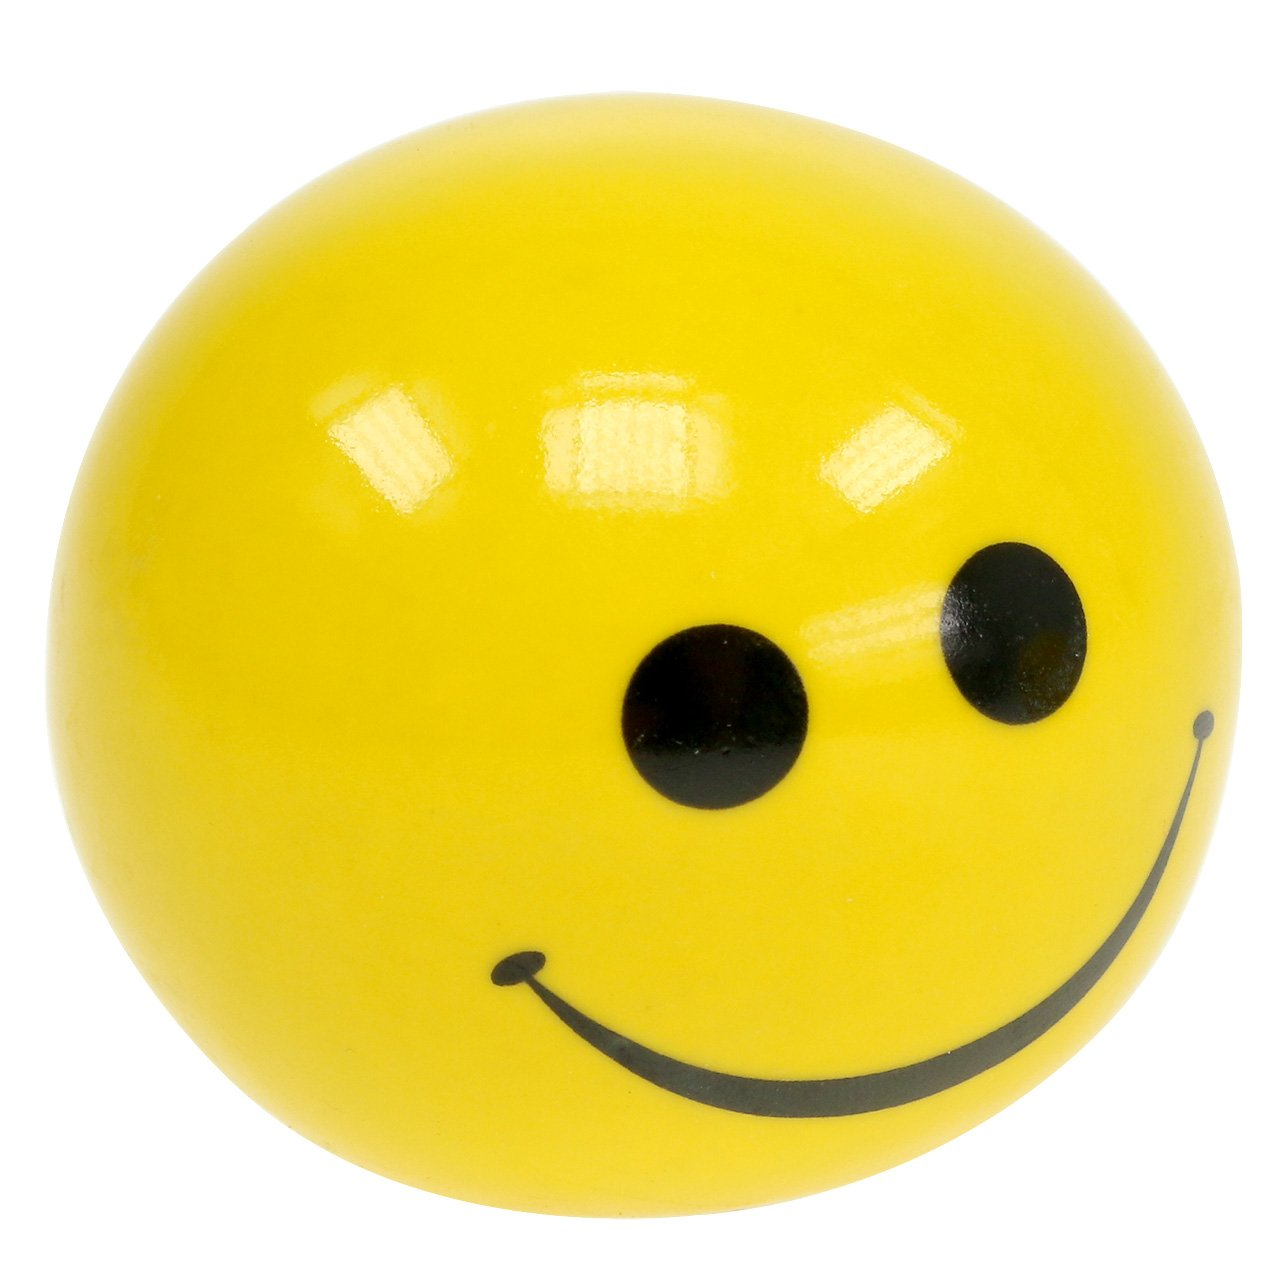 Ceramic ball with Smeili yellow Ø5cm H4.5cm 6pcs